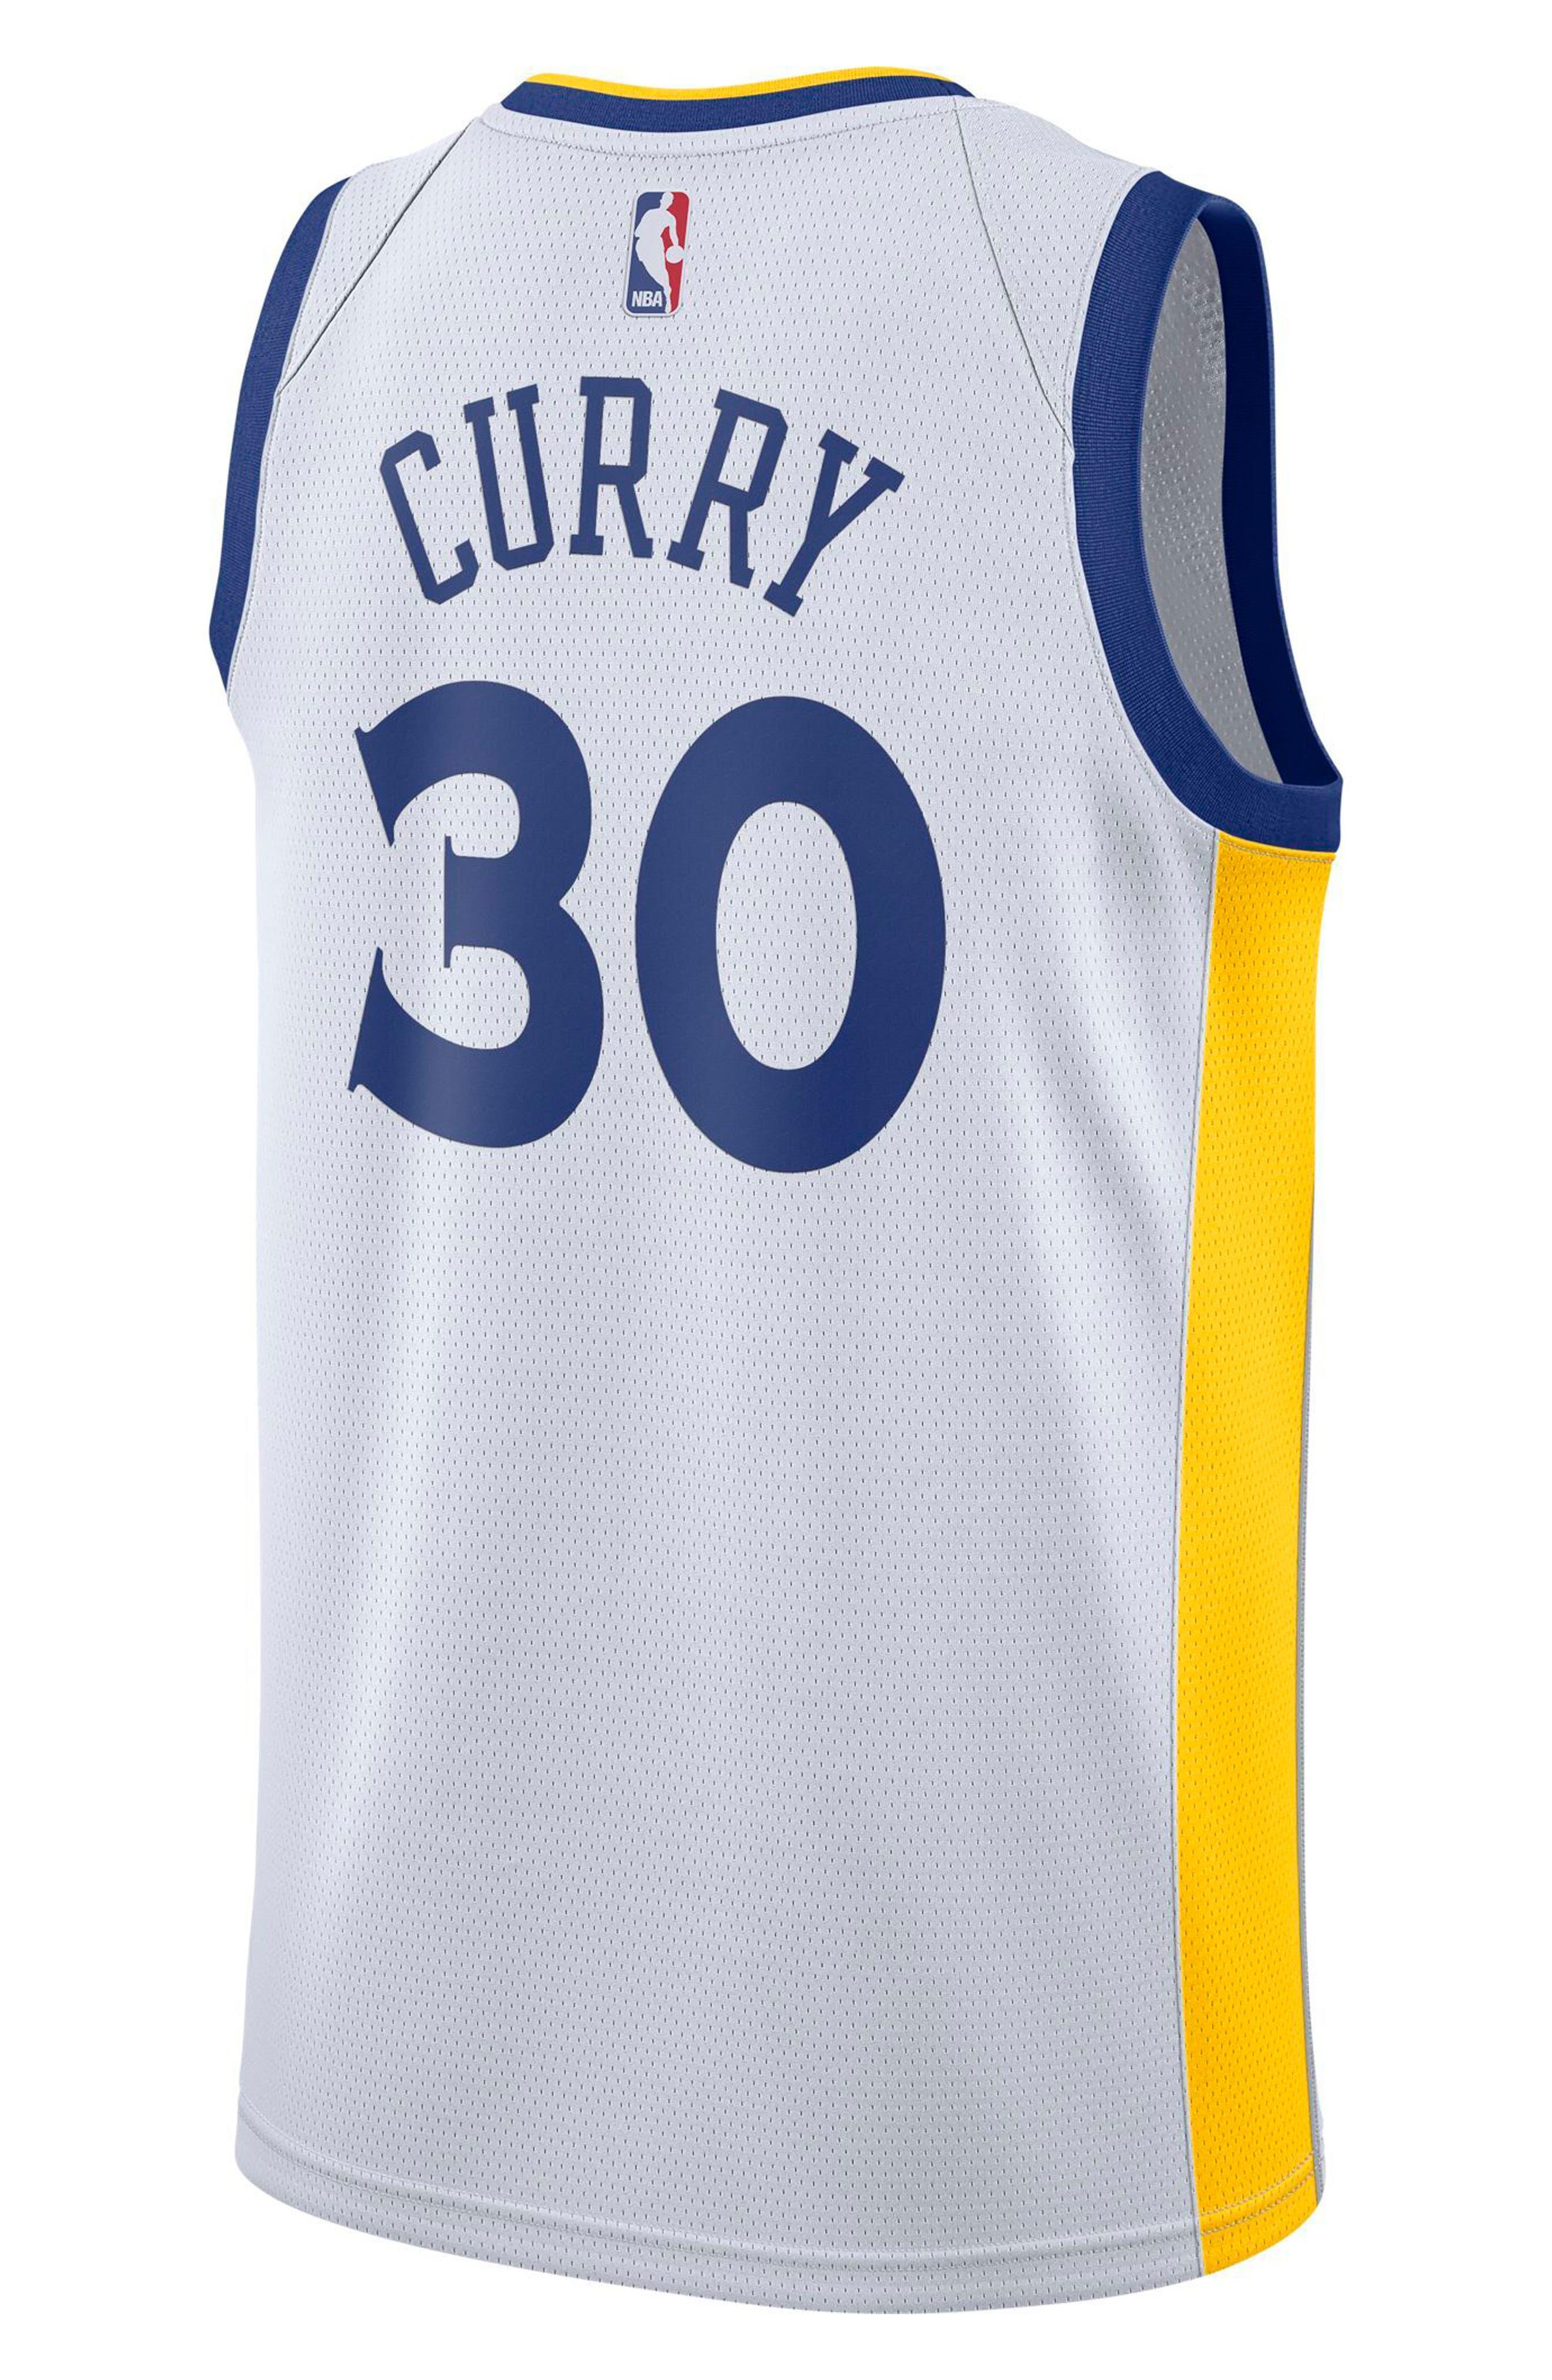 Golden State Warriors Nike Association Edition Swingman Men's NBA Jersey,                             Alternate thumbnail 2, color,                             White/ Amarillo/ Rush Blue